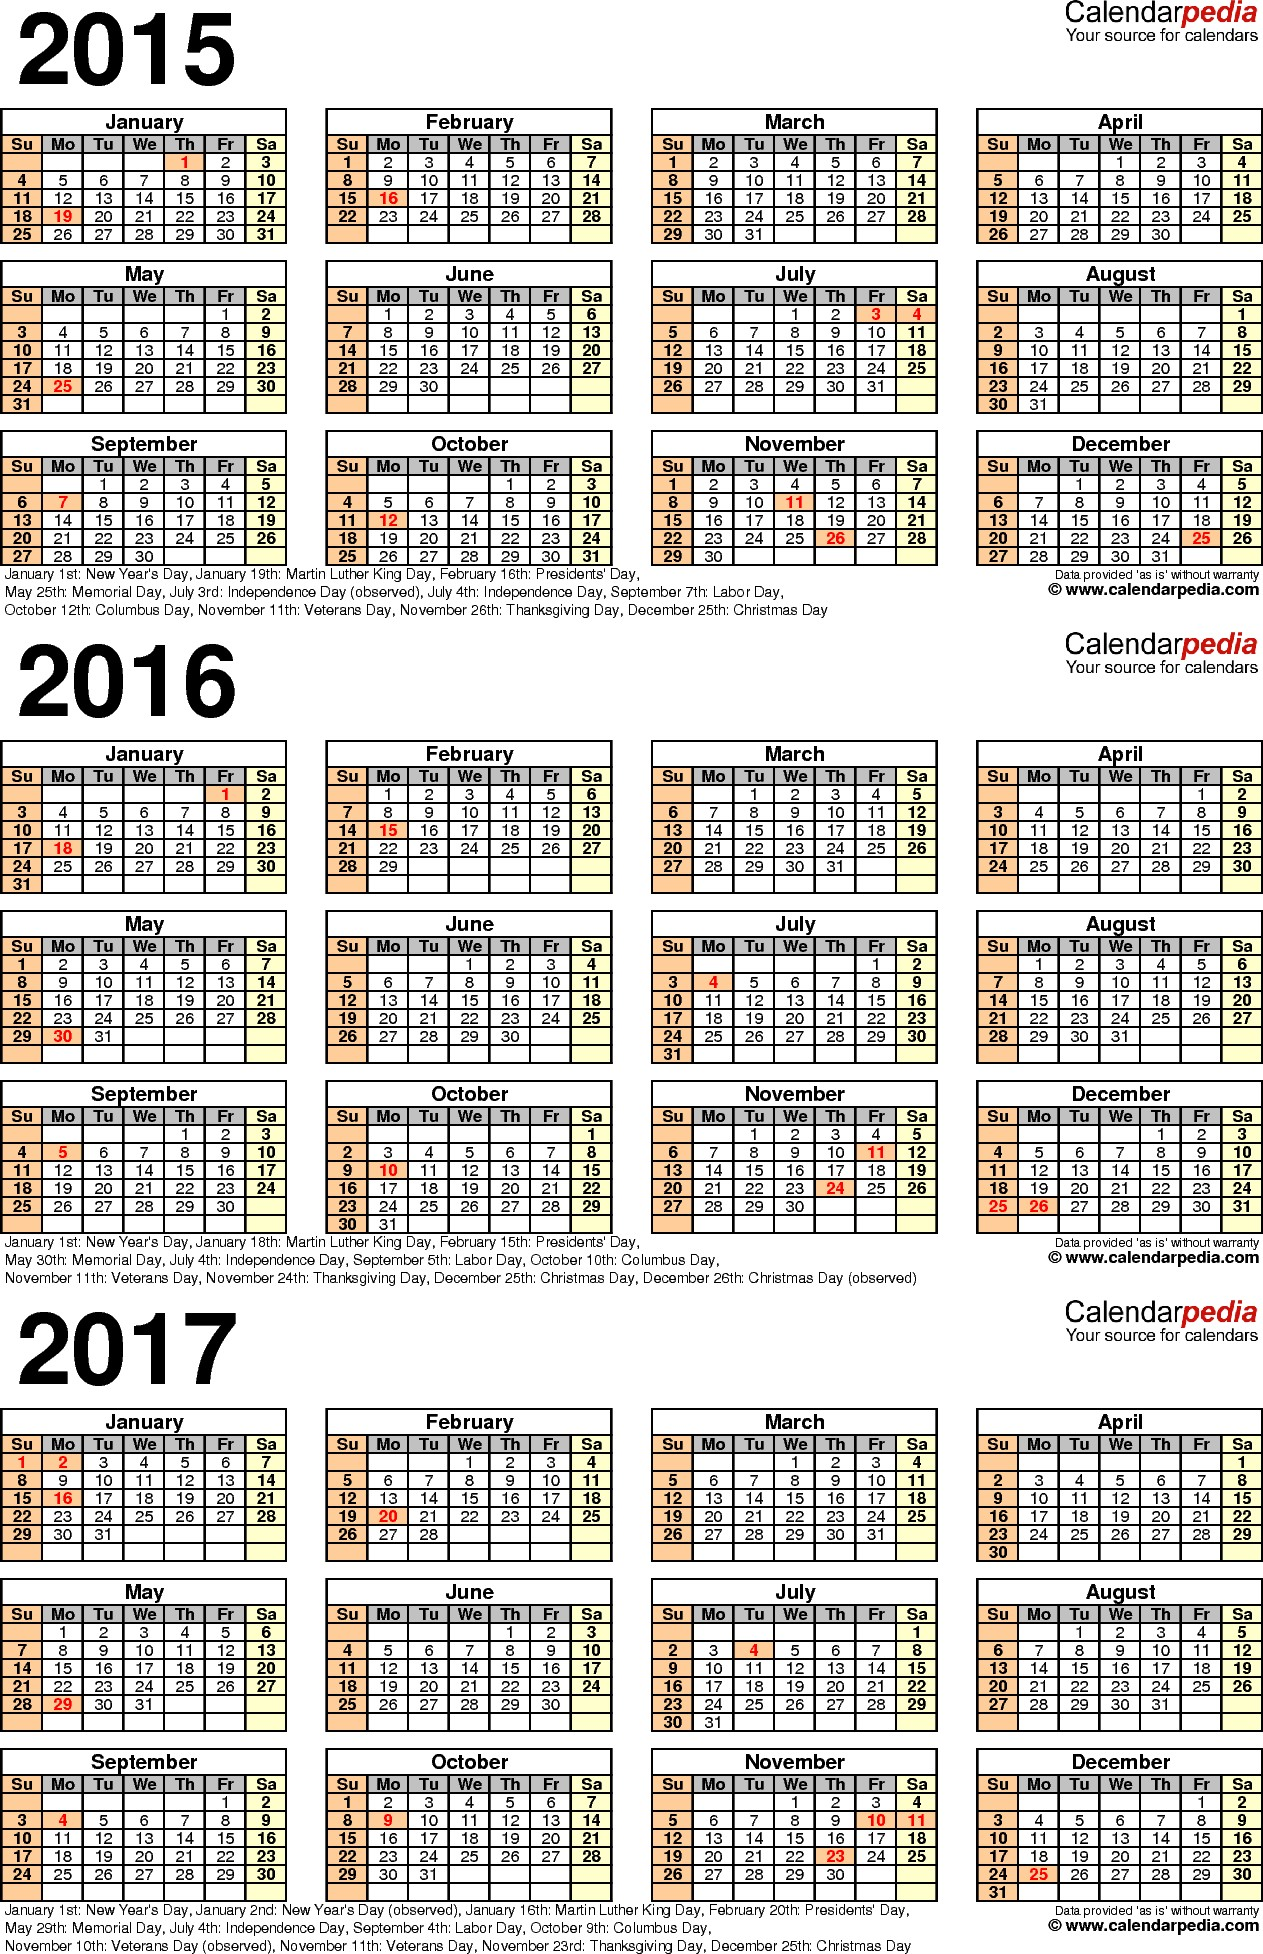 Template 4 PDF template for three year calendar 2015 2017 portrait orientation